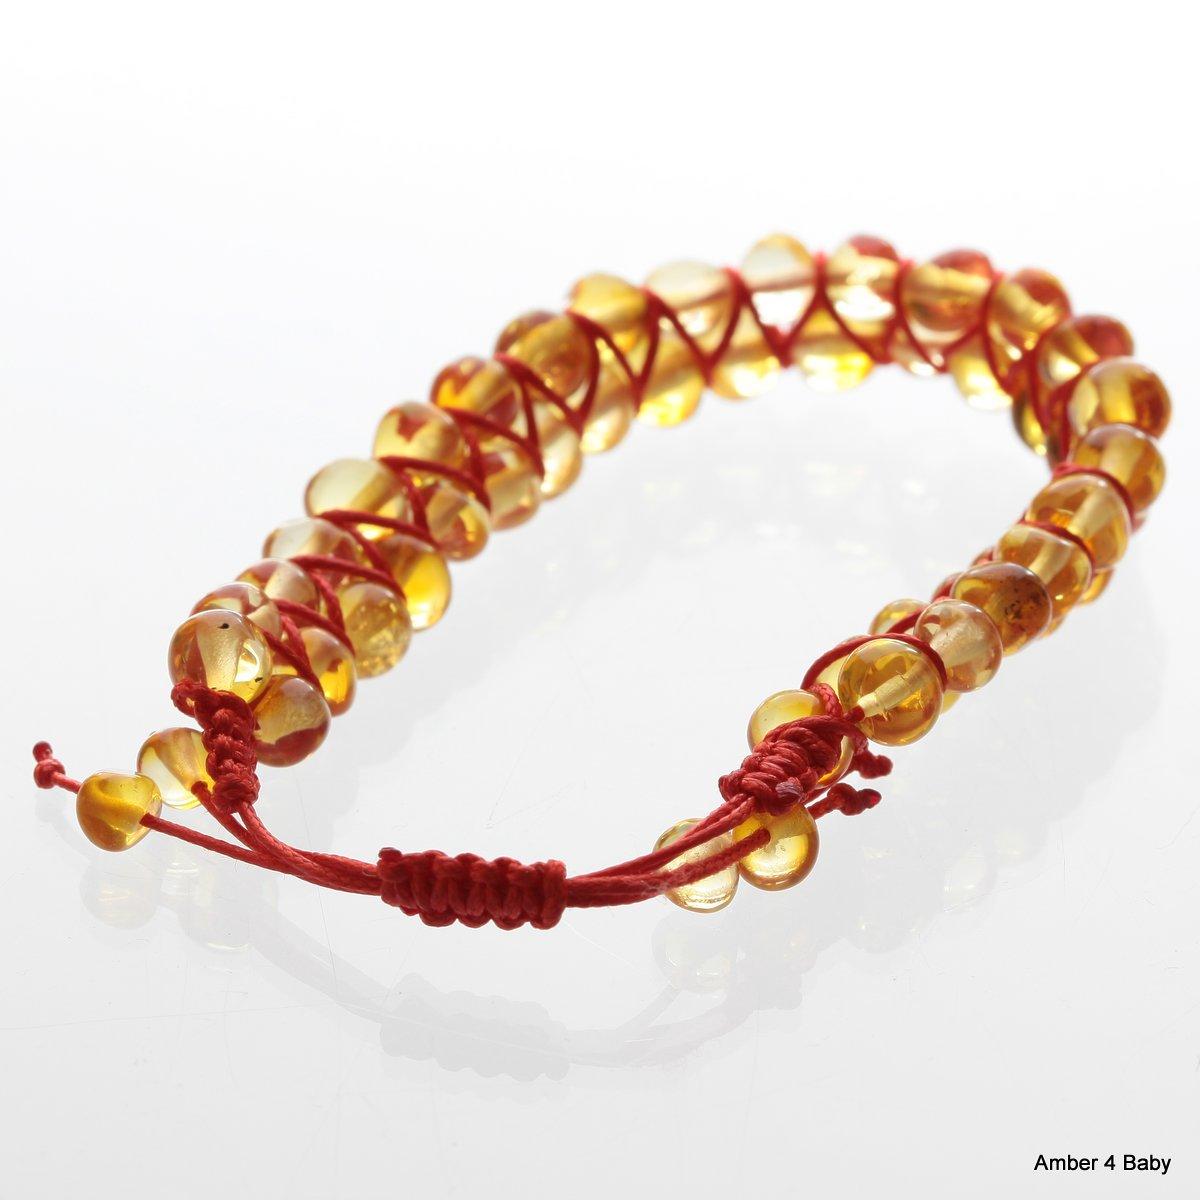 High quality amber Amber bracelet for Adult Adult Baltic Amber Bracelet Baltic Amber Genuine Baltic Amber Amber bracelet